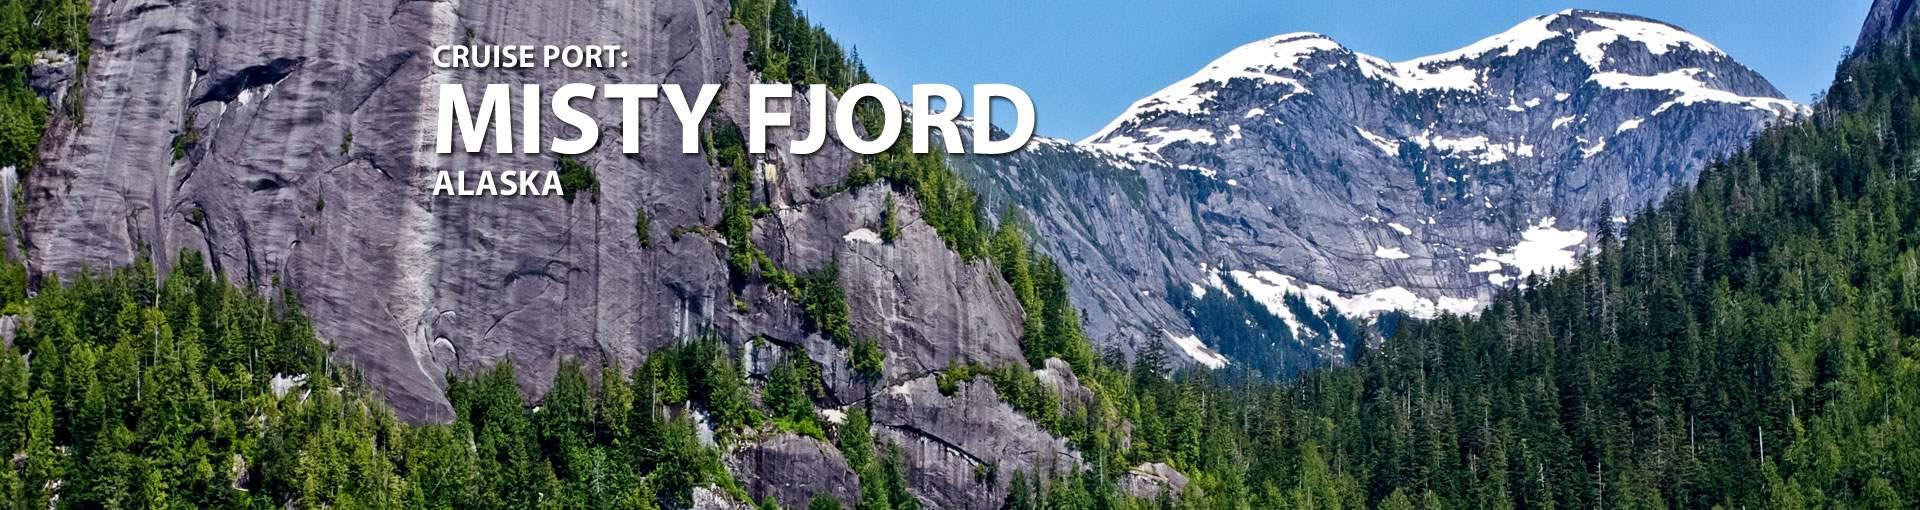 Cruises to Misty Fjord, Alaska